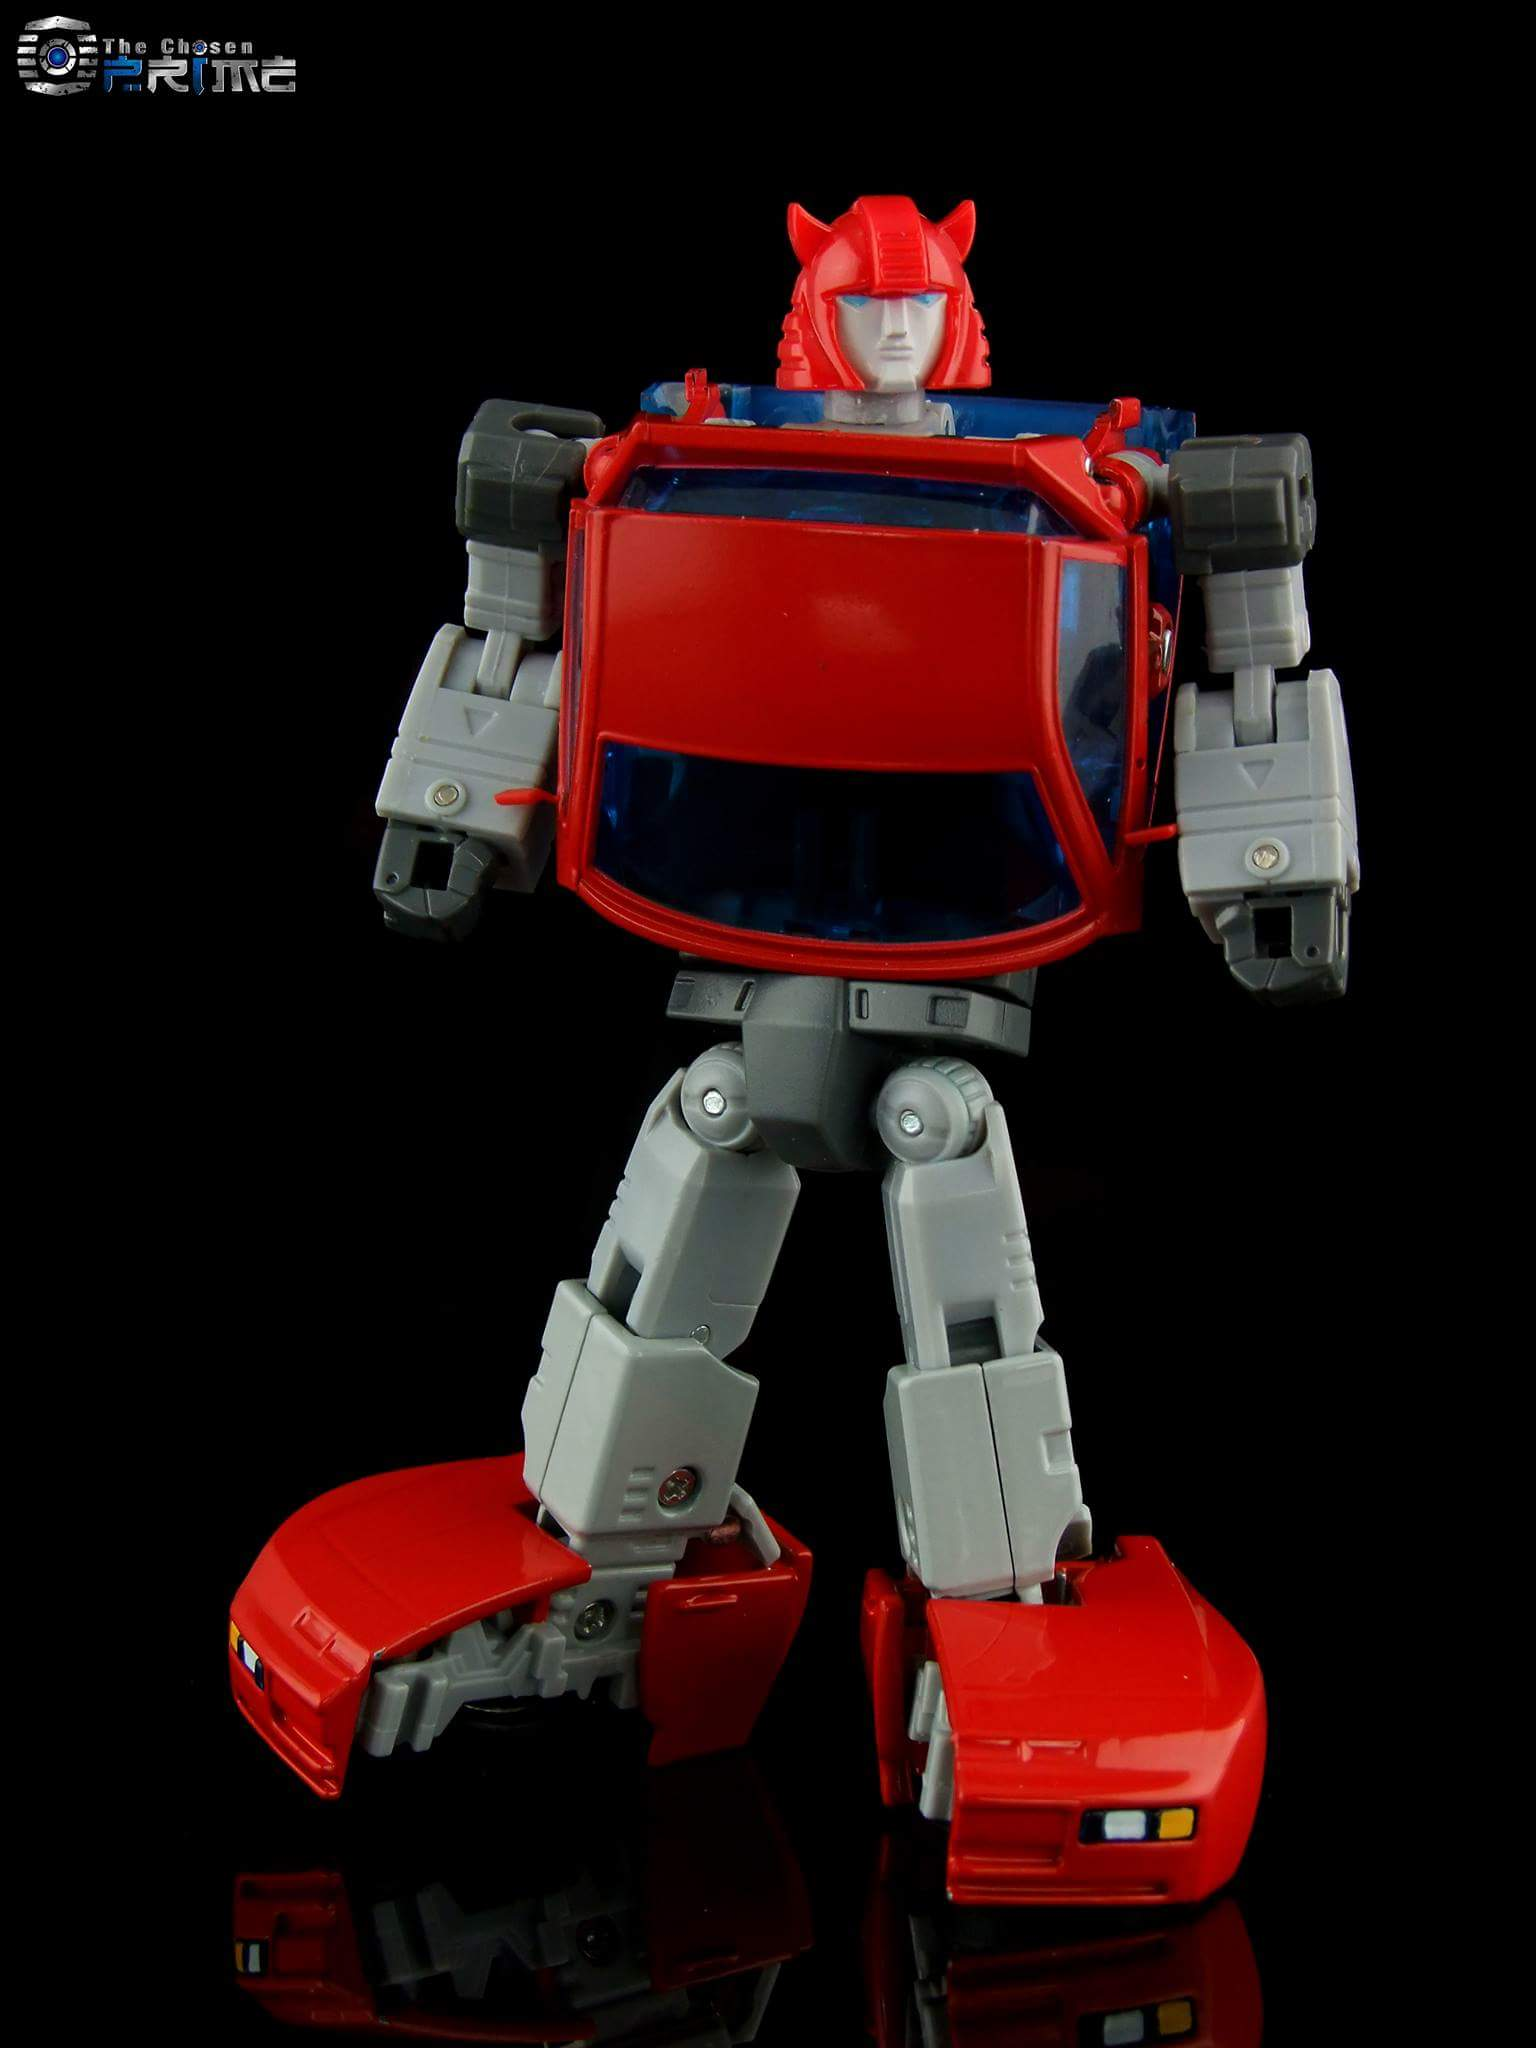 [ACE Collectables] Produit Tiers - Minibots MP - ACE-01 Tumbler (aka Cliffjumper/Matamore), ACE-02 Hiccups (aka Hubcap/Virevolto), ACE-03 Trident (aka Seaspray/Embruns) CDv2Gi63